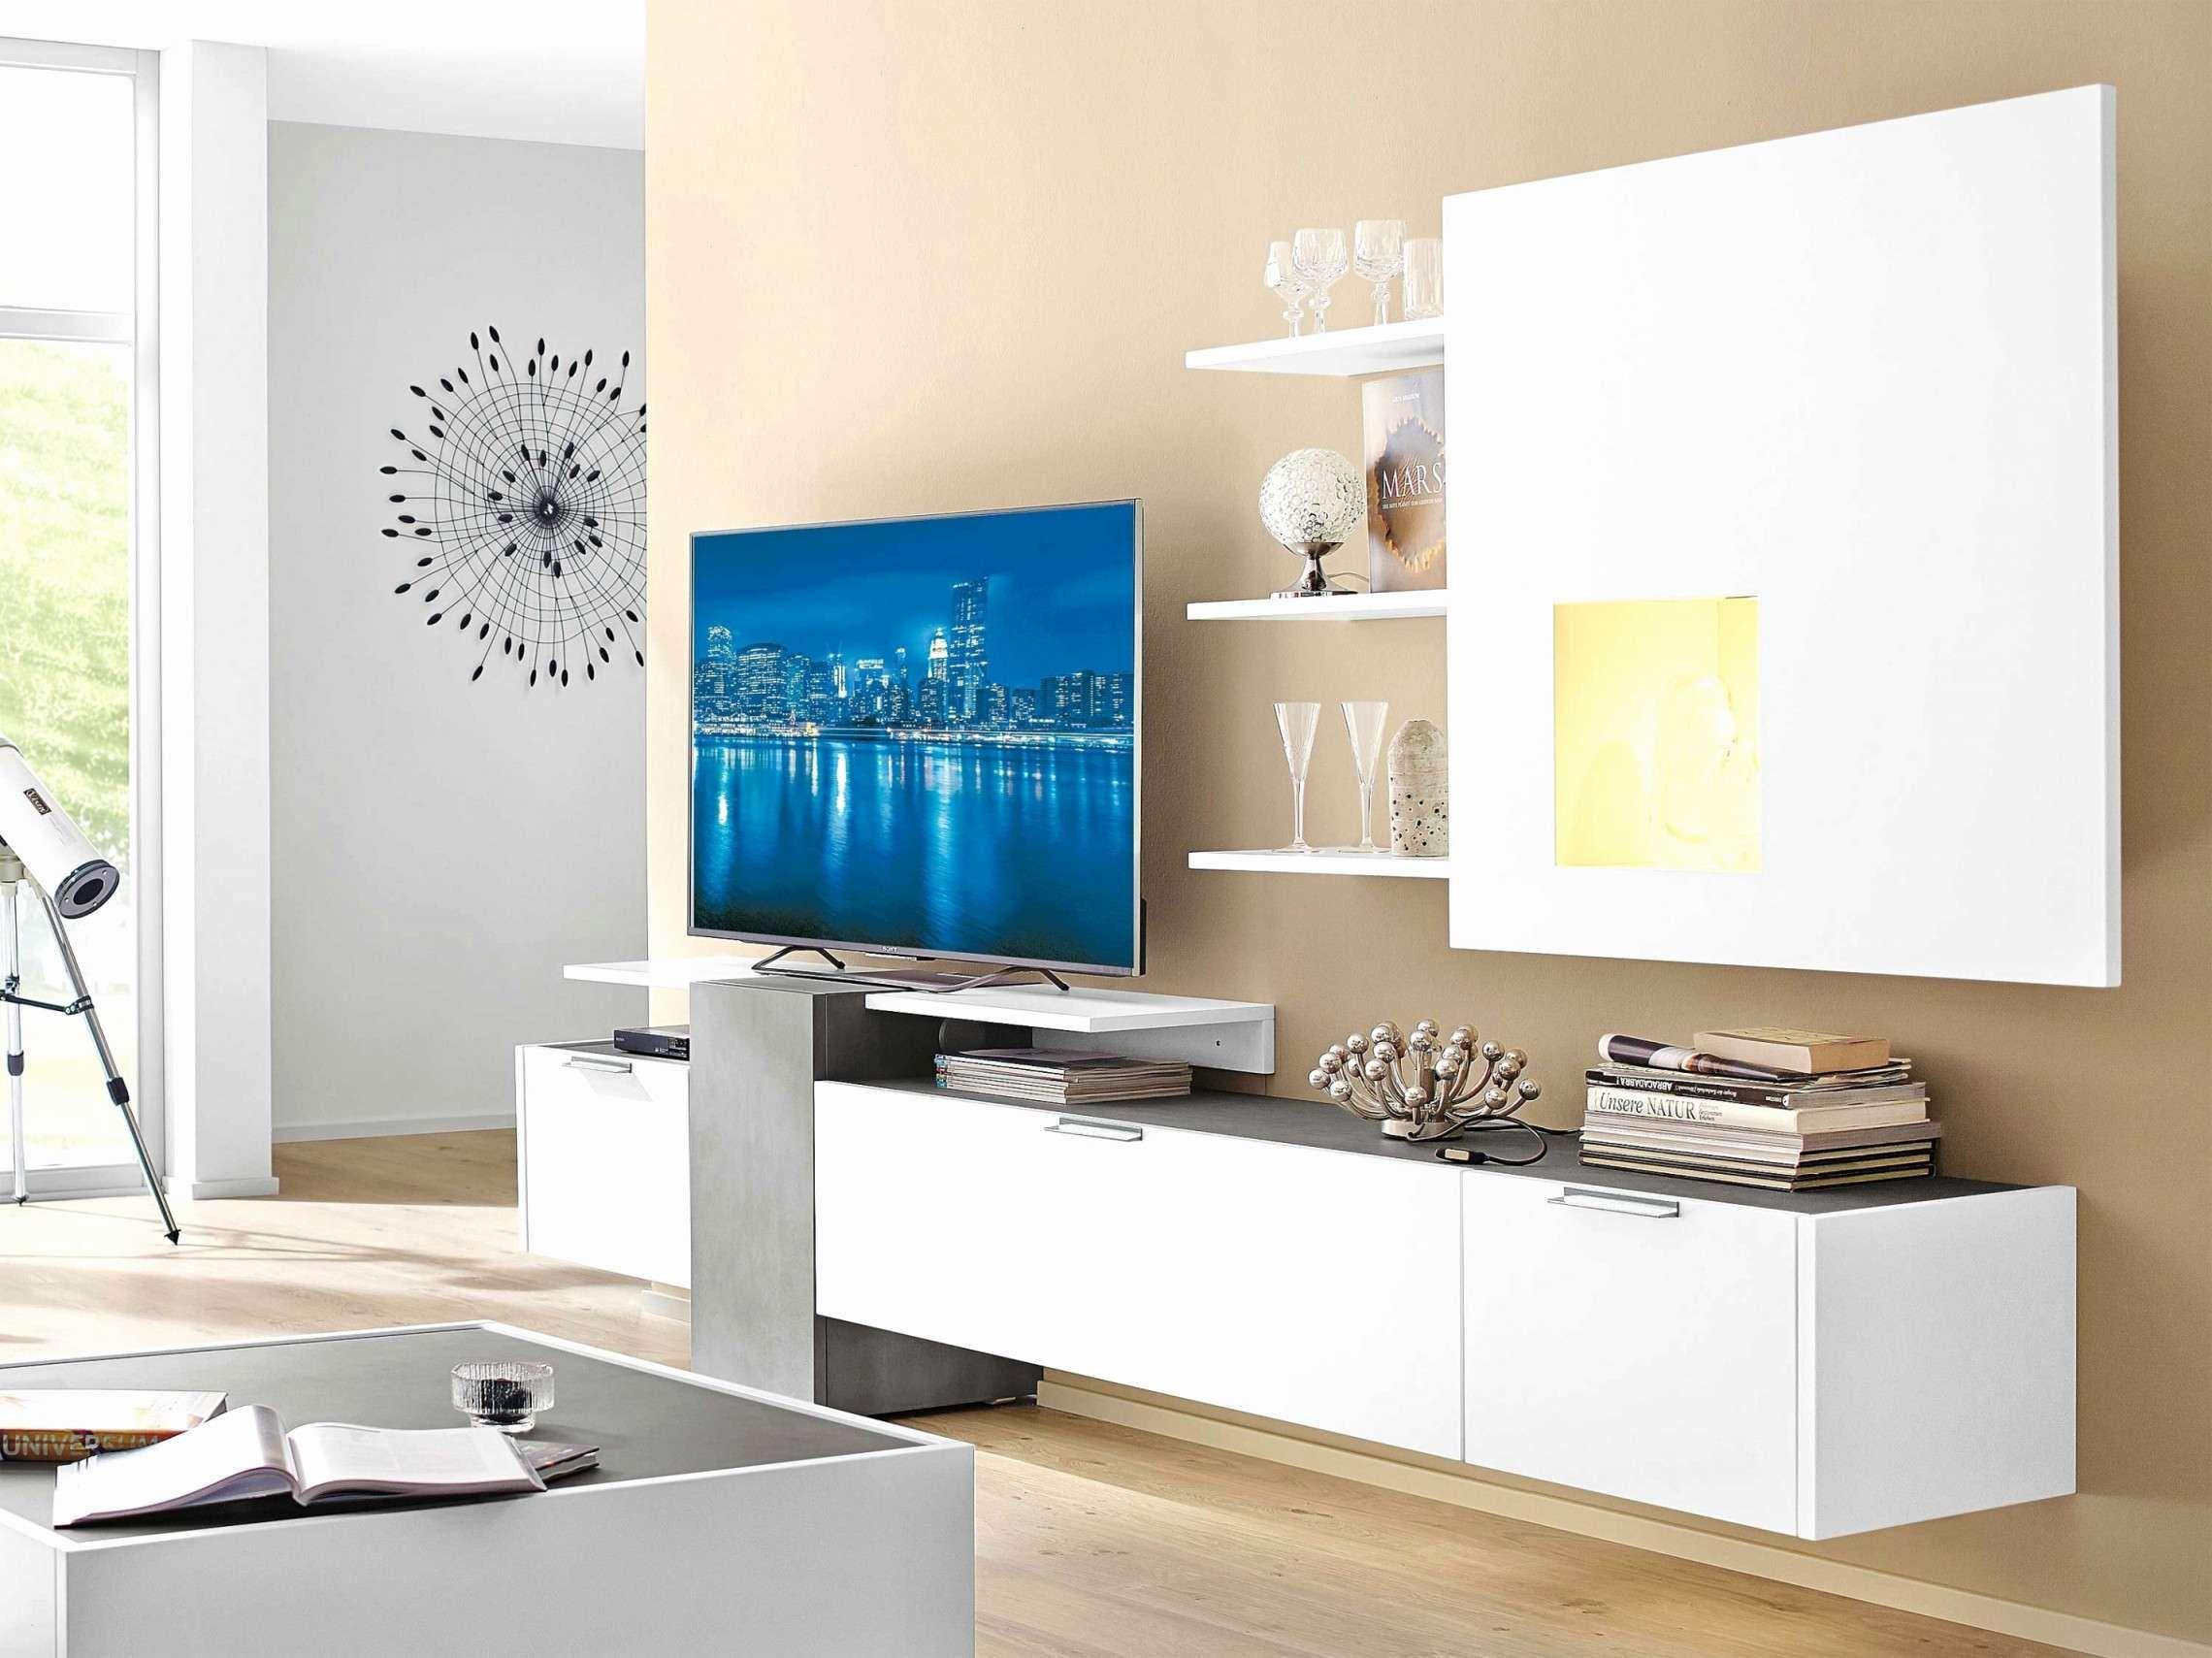 Mobel 24 Wohnwand 35 Moderne Tv Mobel Konfigurieren In 2020 Sliding Door Wardrobe Designs Vintage Sideboard Design